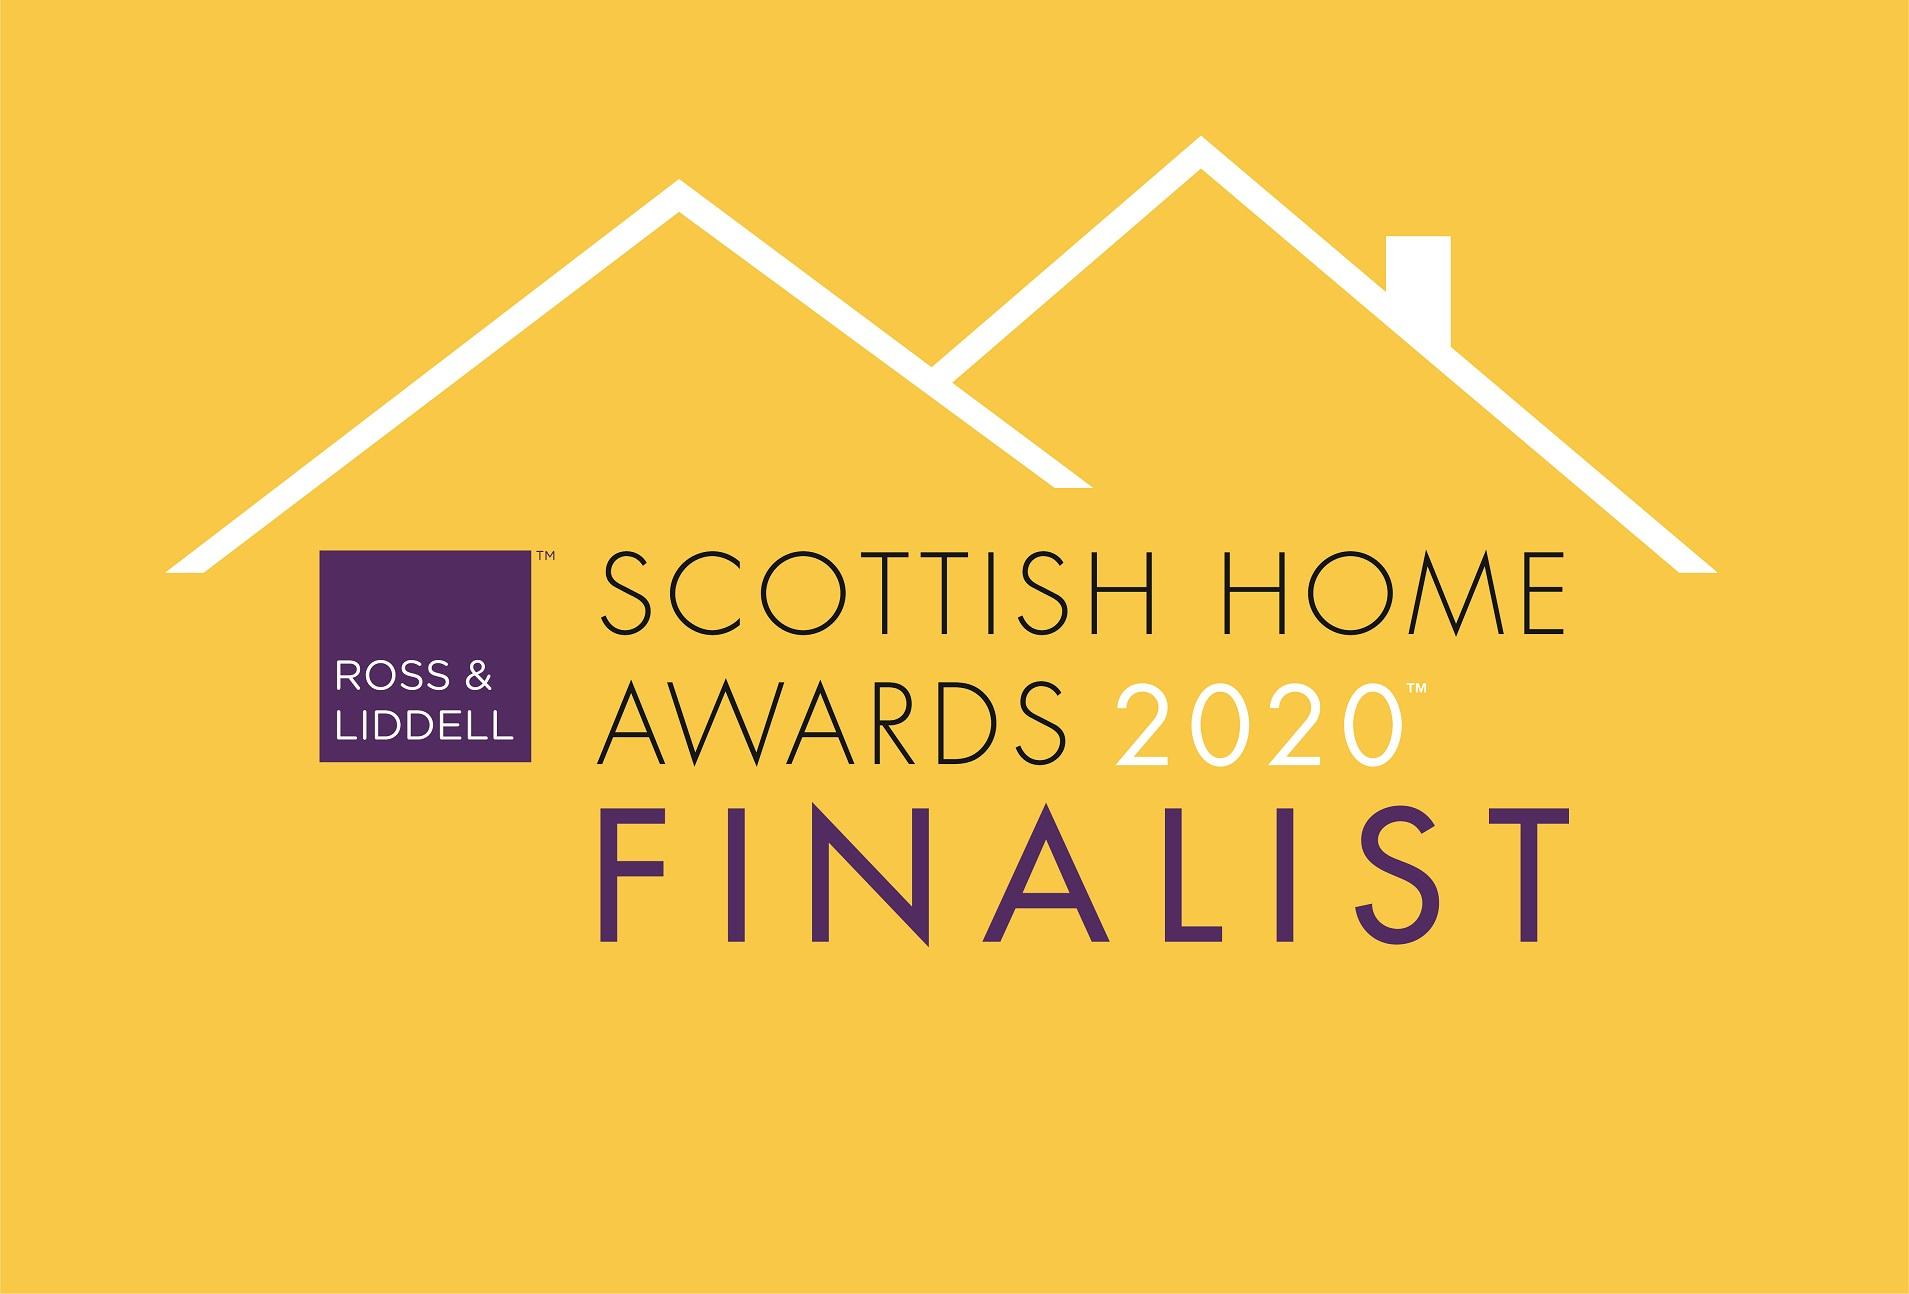 Scottish Home Awards 2020